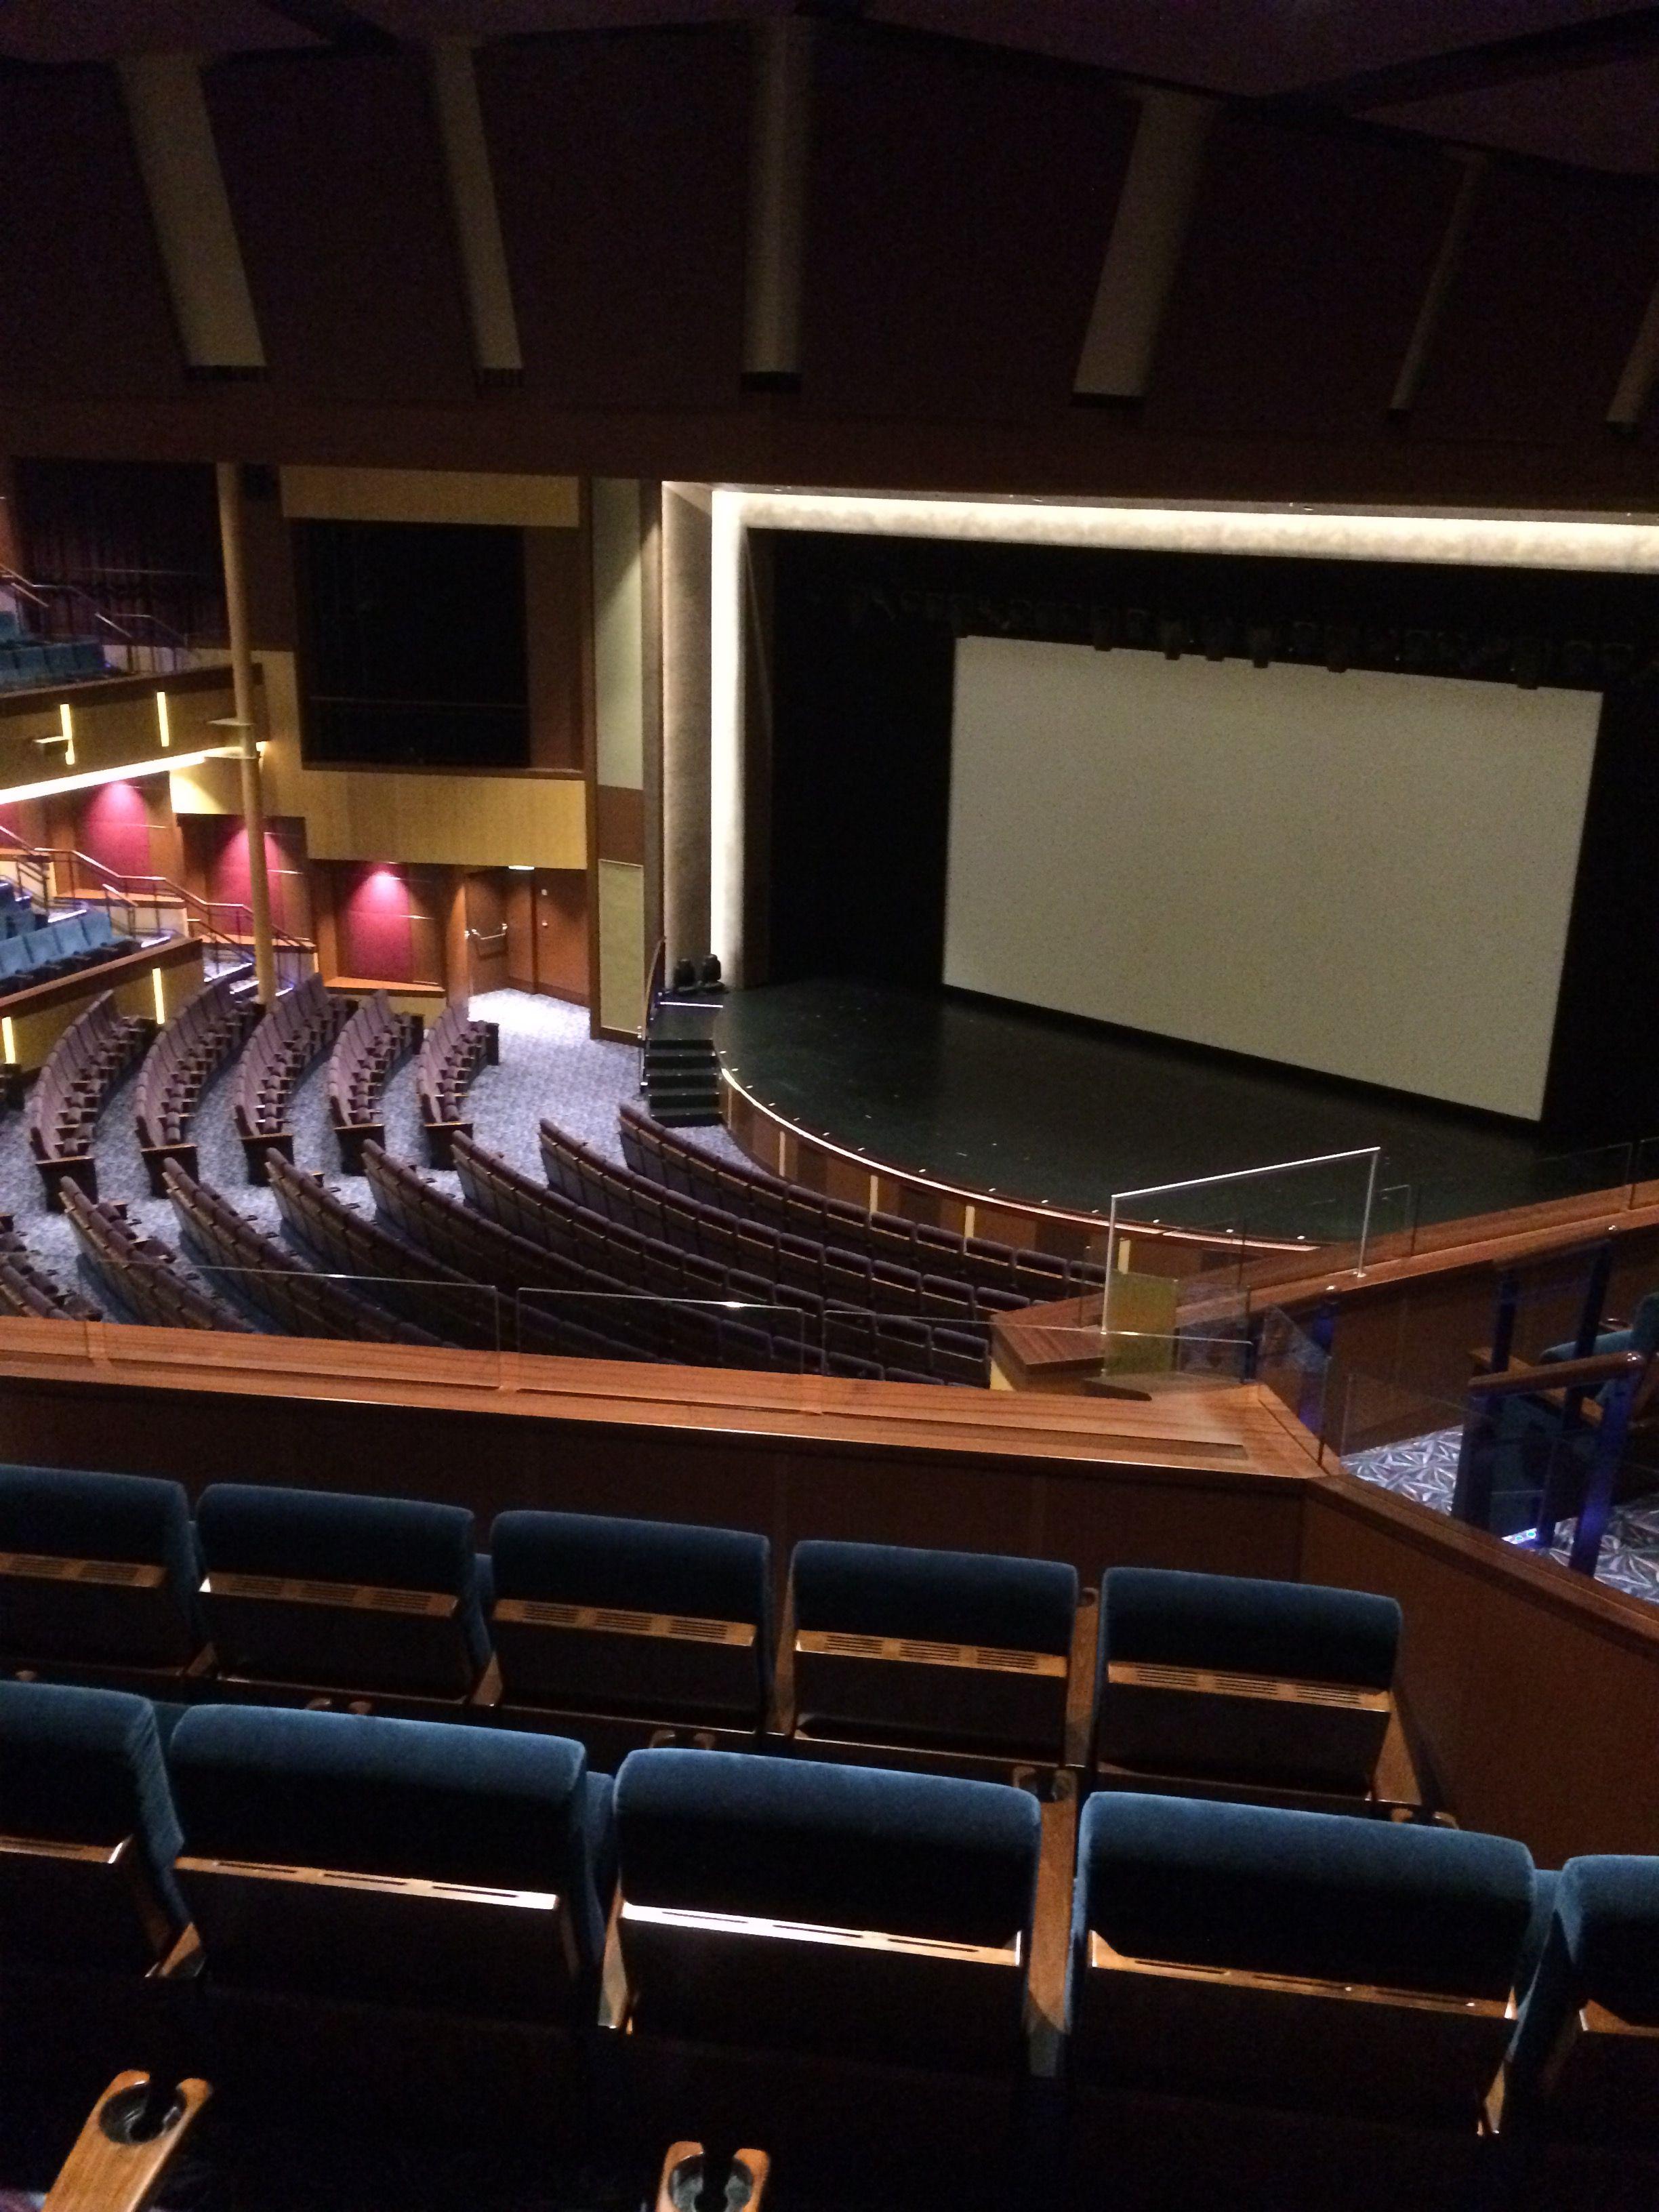 Ovation Of The Seas Theatre Symphony Of The Seas Royal Caribbean Caribbean